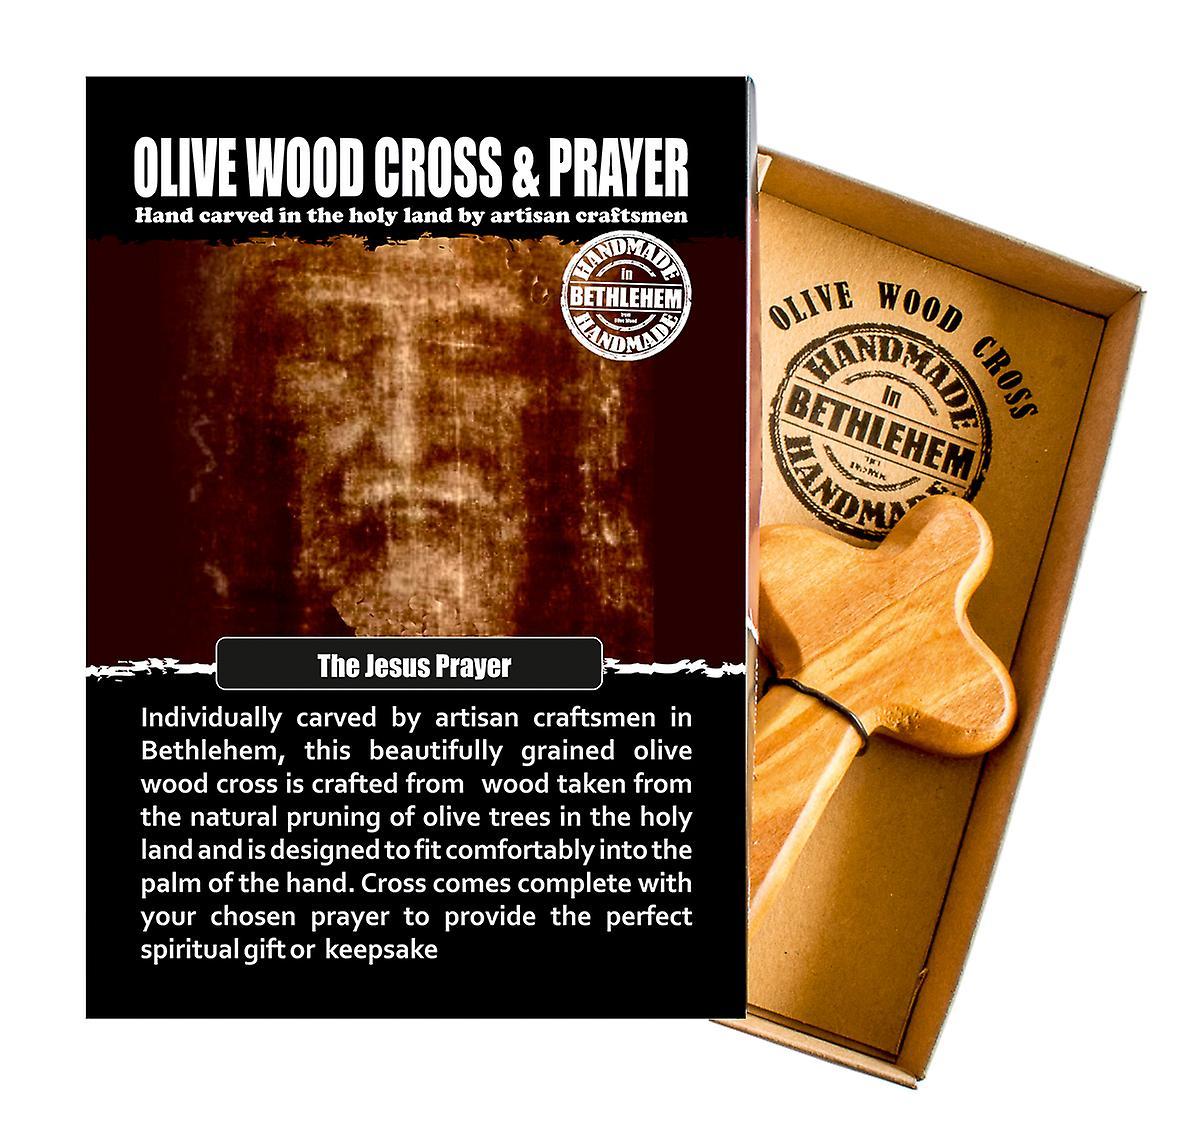 The Jesus Prayer Carved Olive Wood Comfort Cross Religious Keepsake Hand Made In Bethlehem